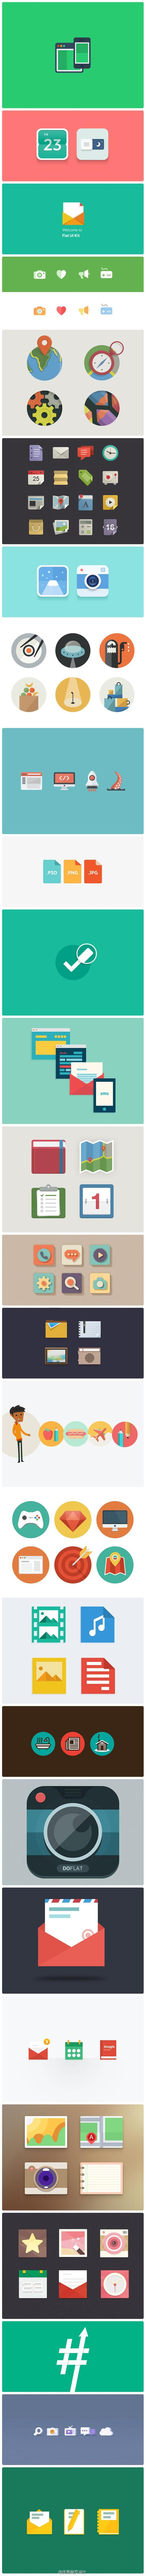 Digital | Flat Icons / #flat #icons - Flat Icons